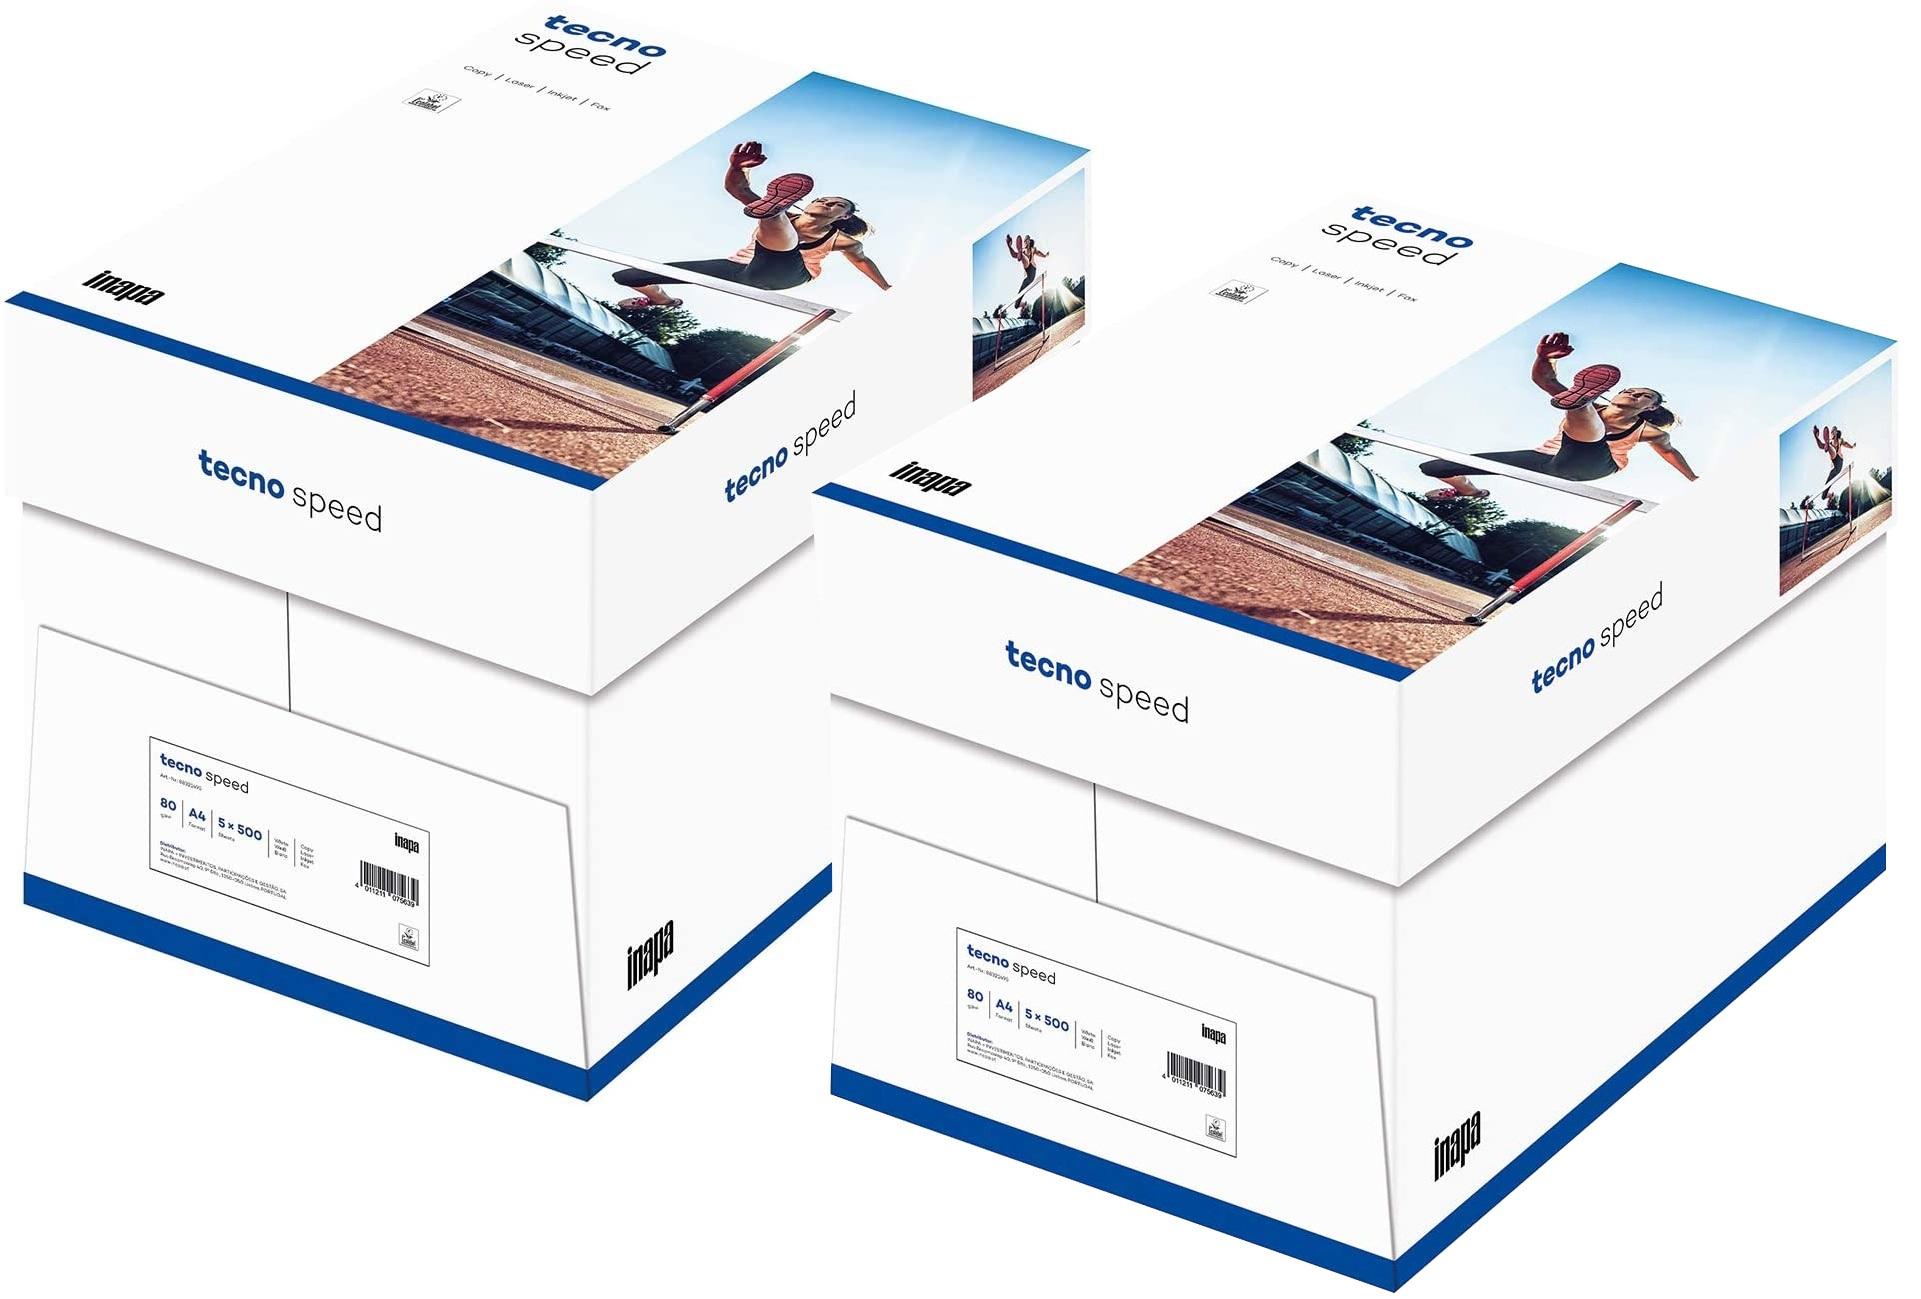 inapa Drucker-/Kopierpapier tecno Speed: 80 g/qm², A4, weiß, 5000 Blatt (2x Karton mit je 2500 Blatt